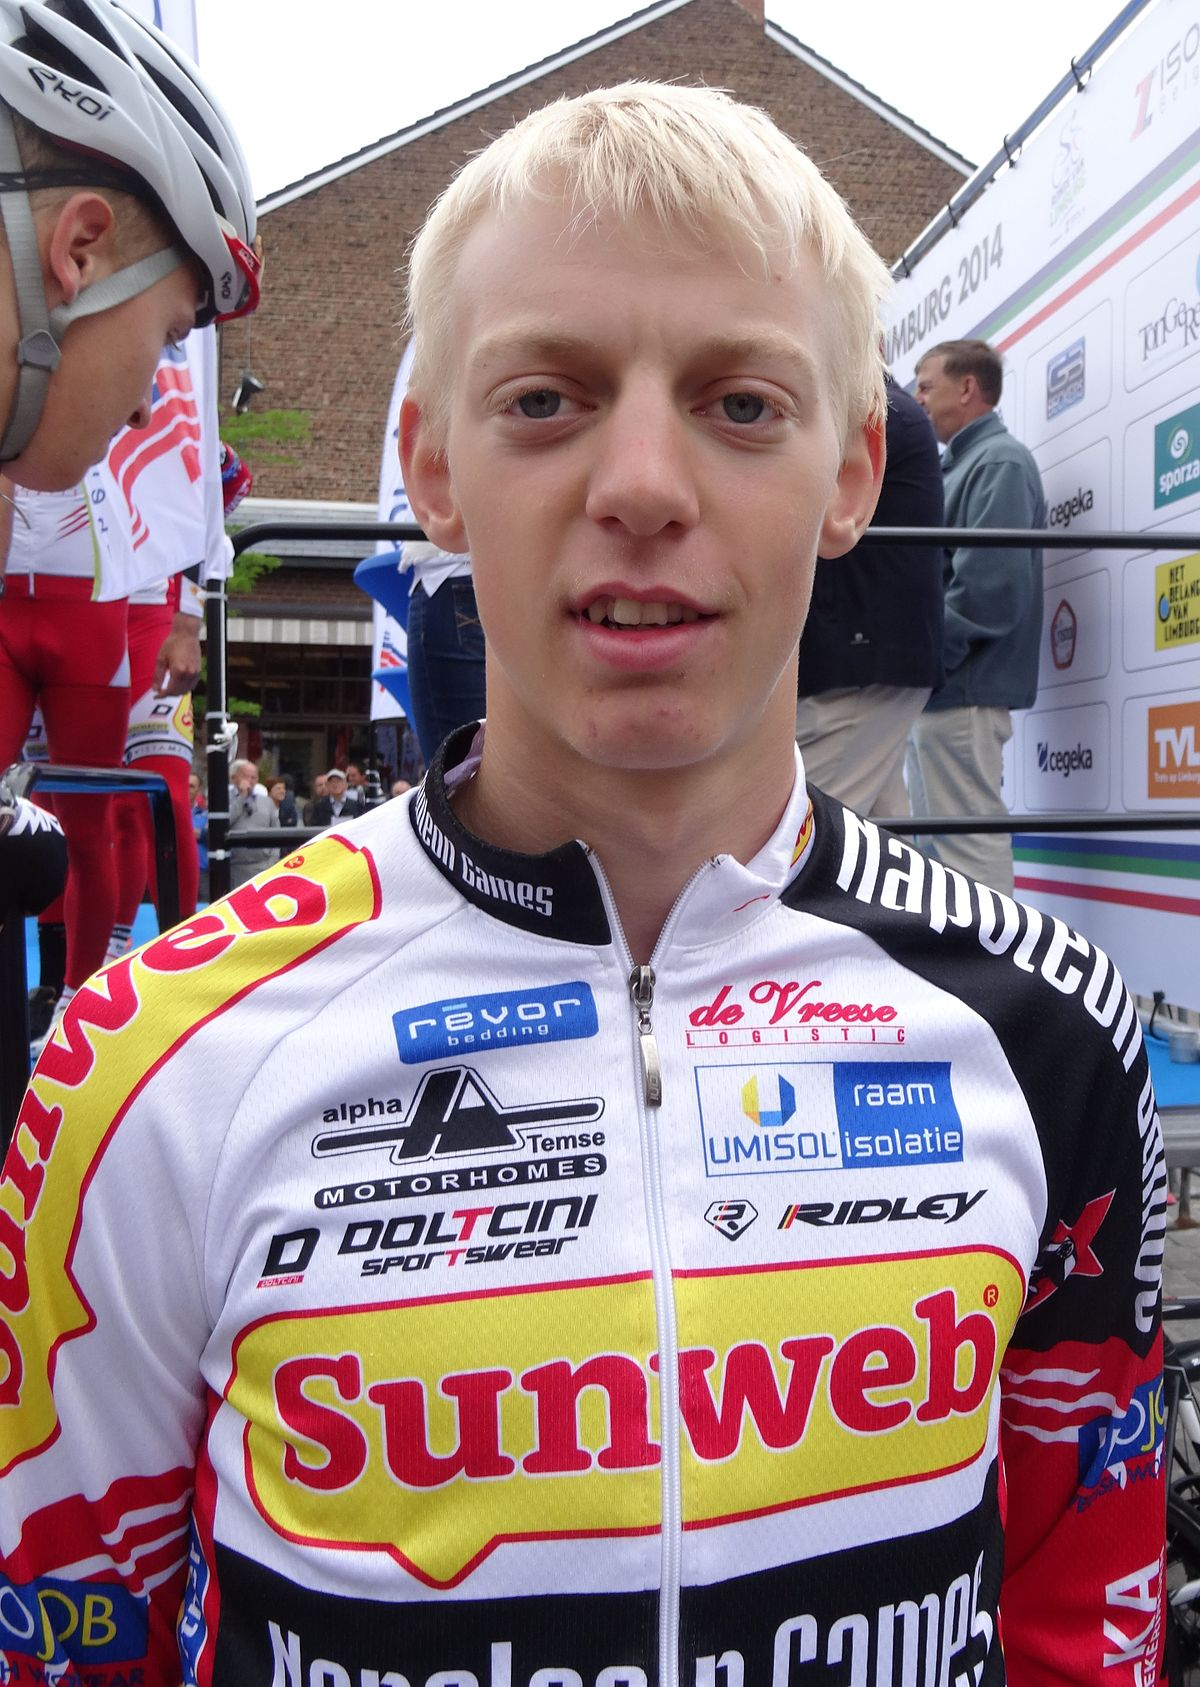 Michael Vanthourenhout - Wikipedia